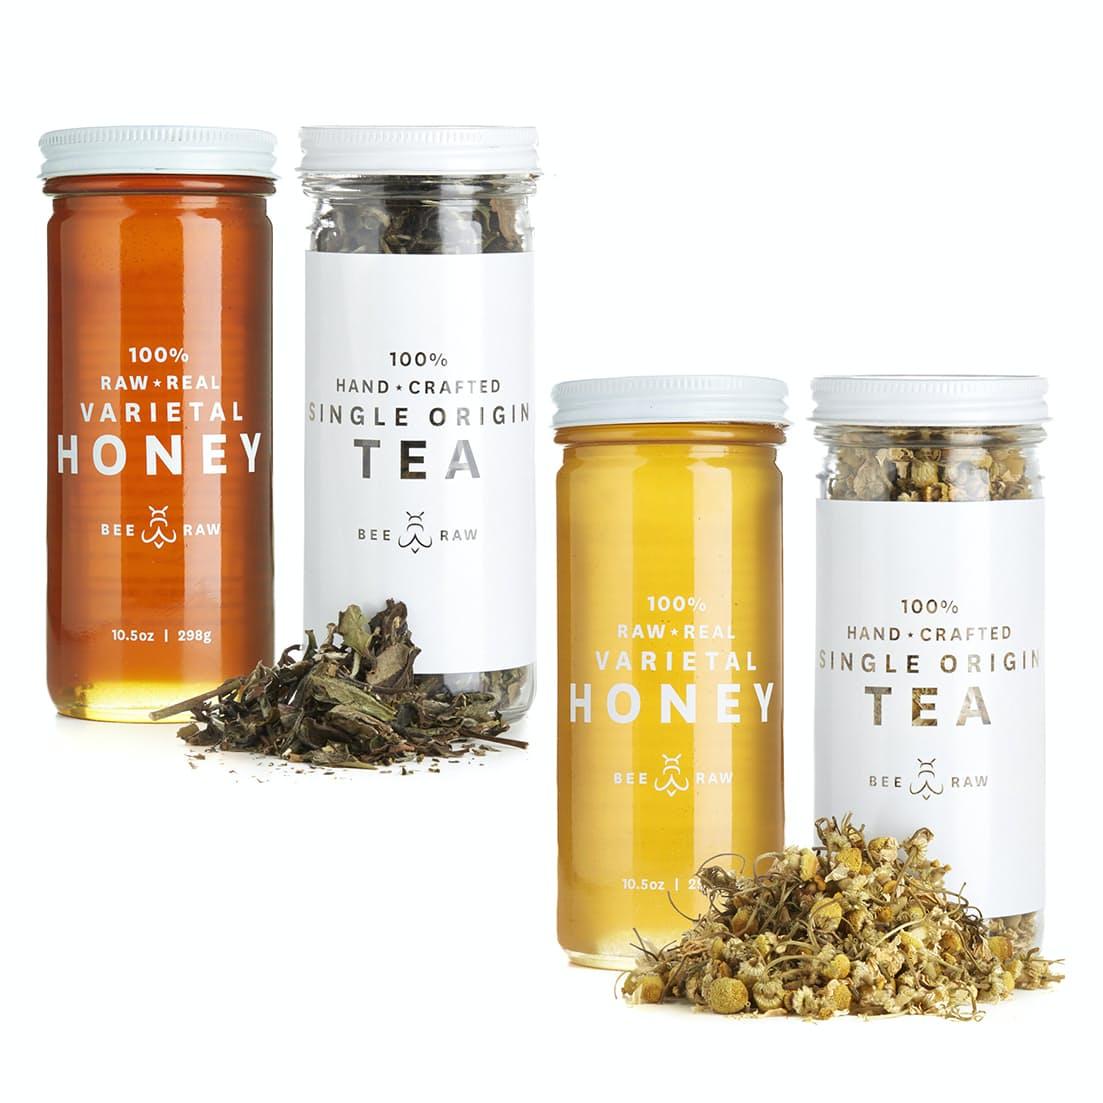 Wajkhbsyqh bee raw calming tea honey set 0 original